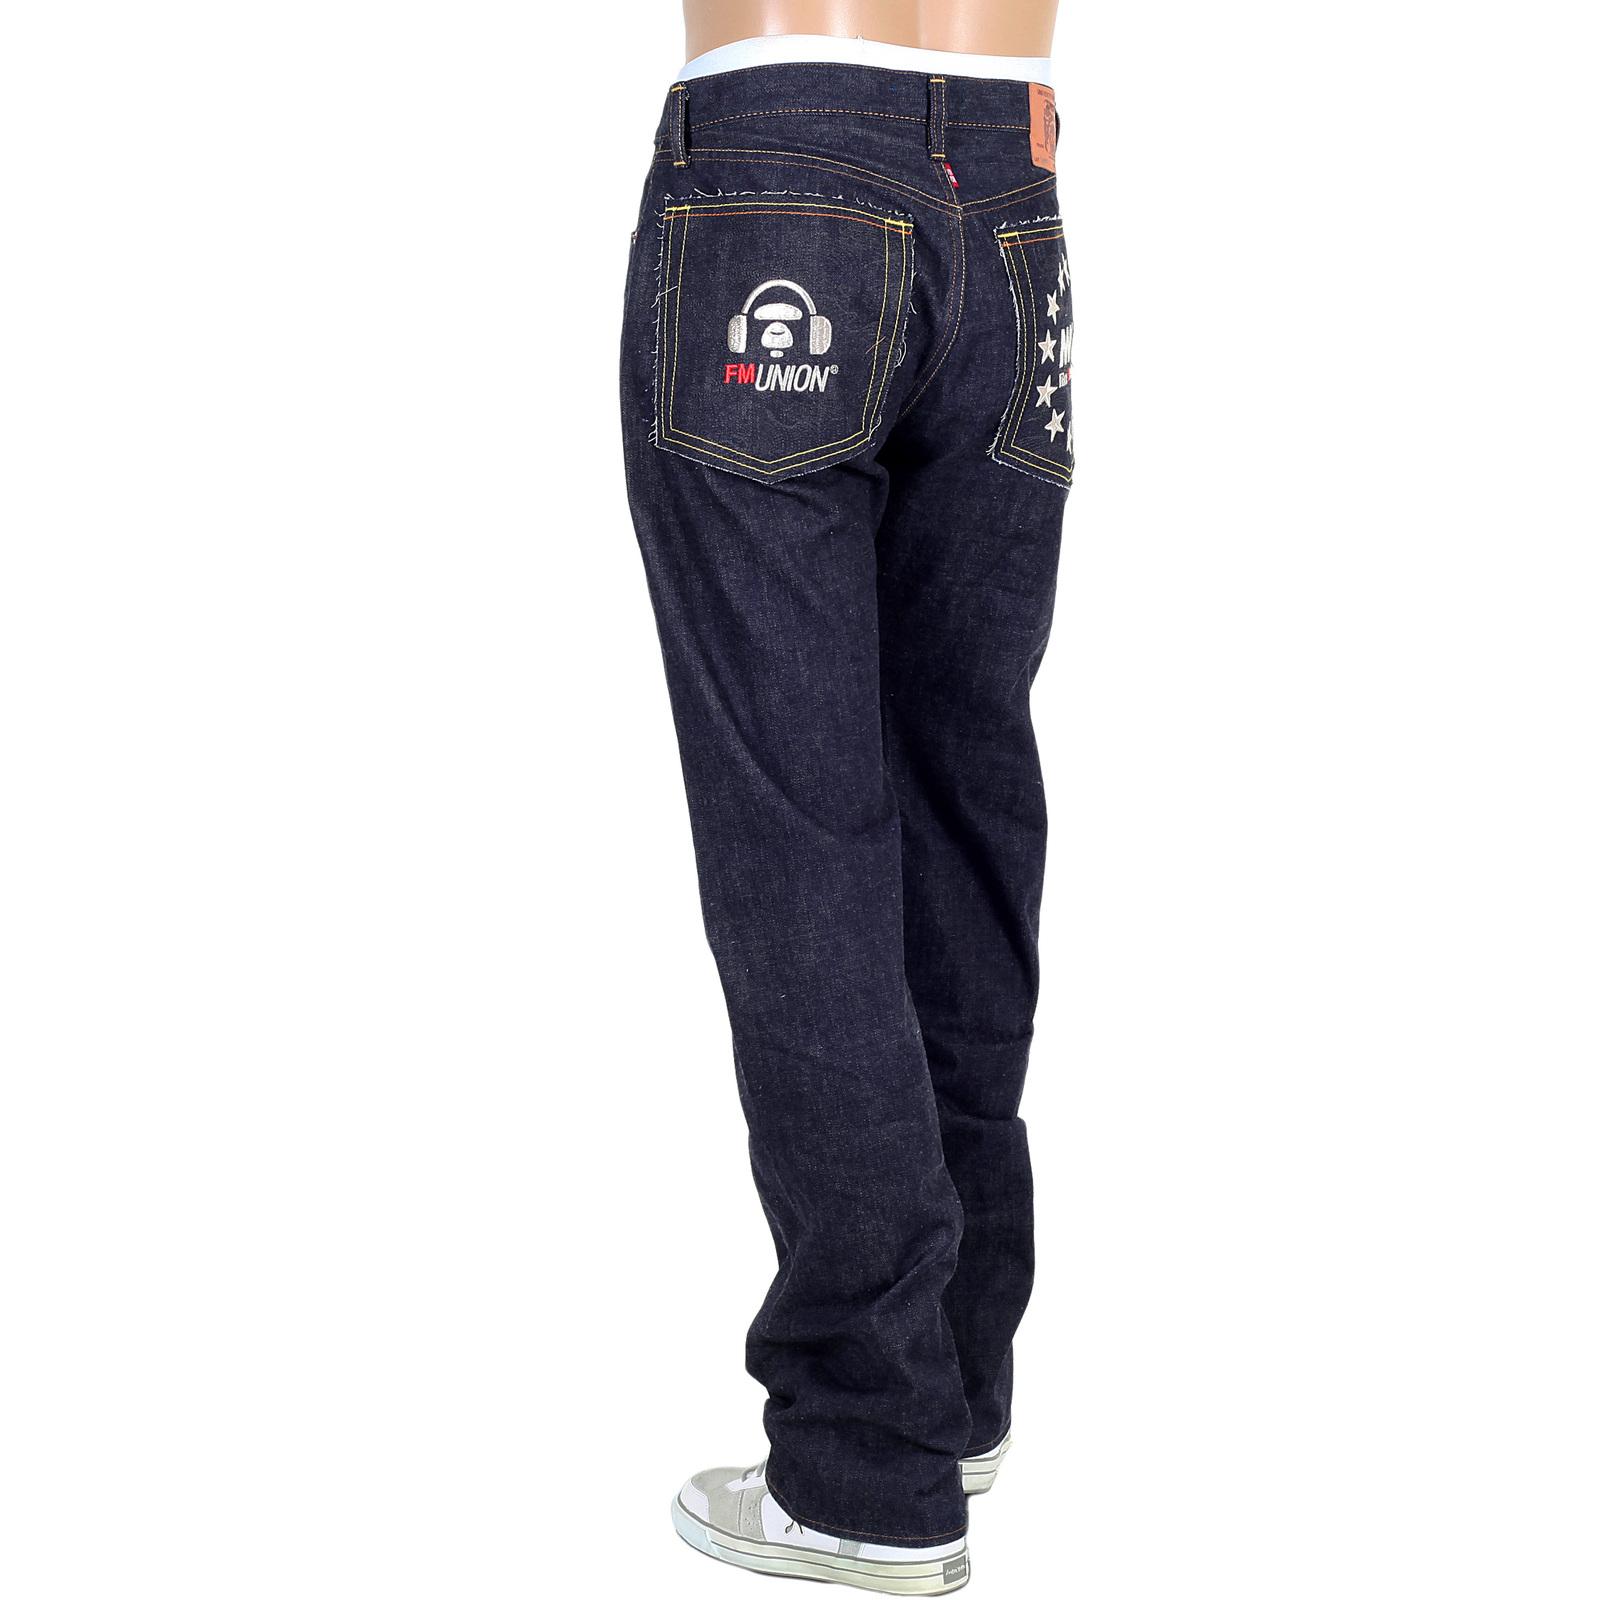 Buy Red Monkey Mens Slim Fit Raw Selvedge Denim Jeans